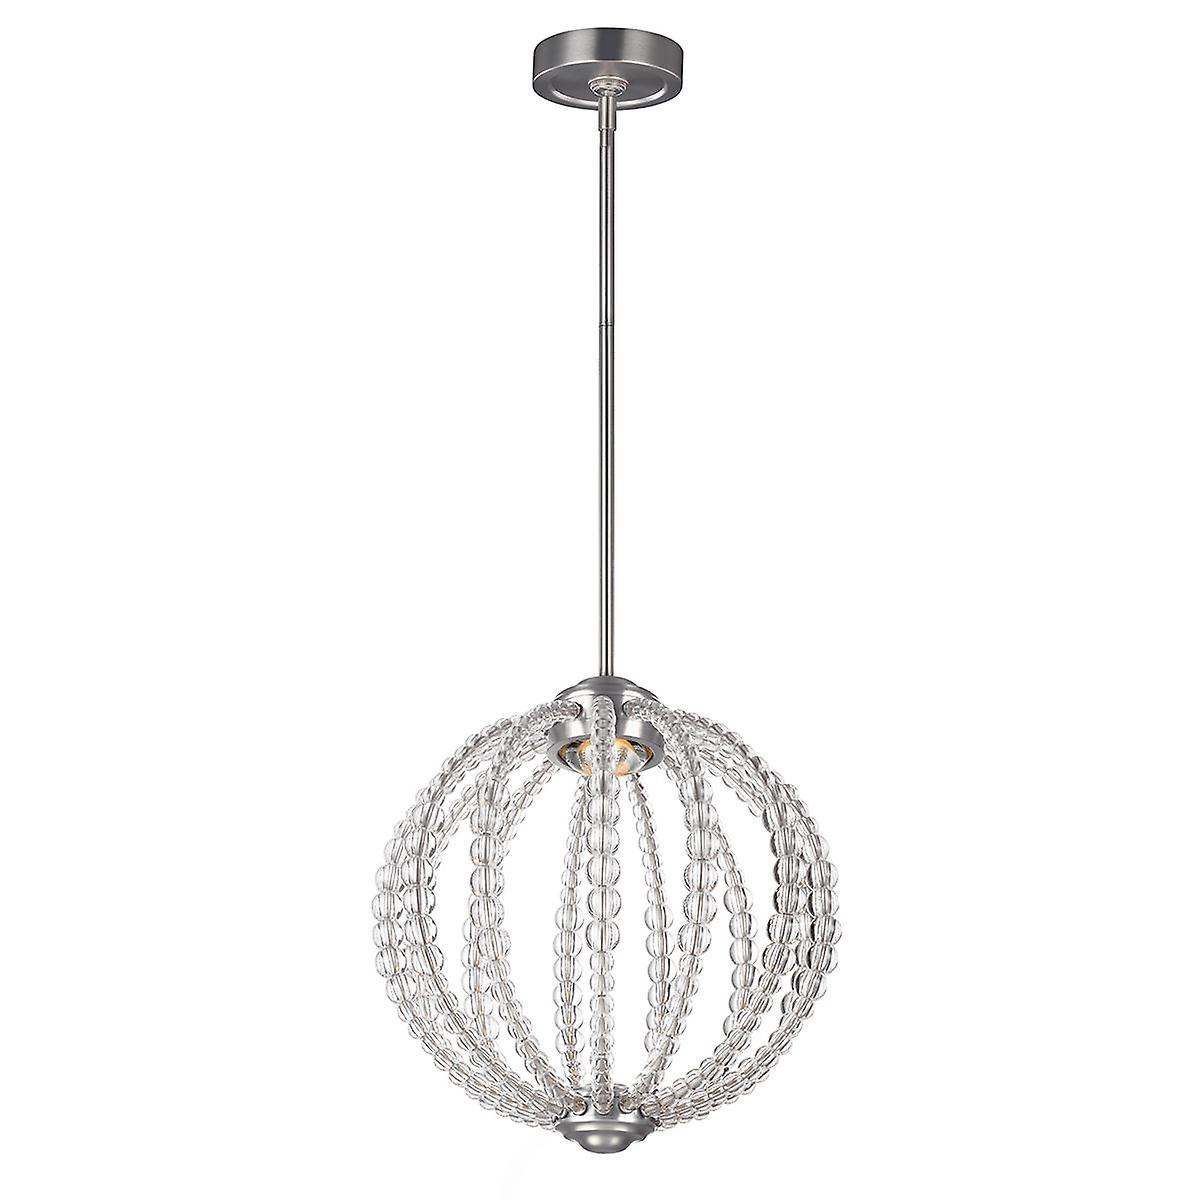 Elstead - Small LED Pendant - Satin Nickel Finish - FE OBERLIN P S